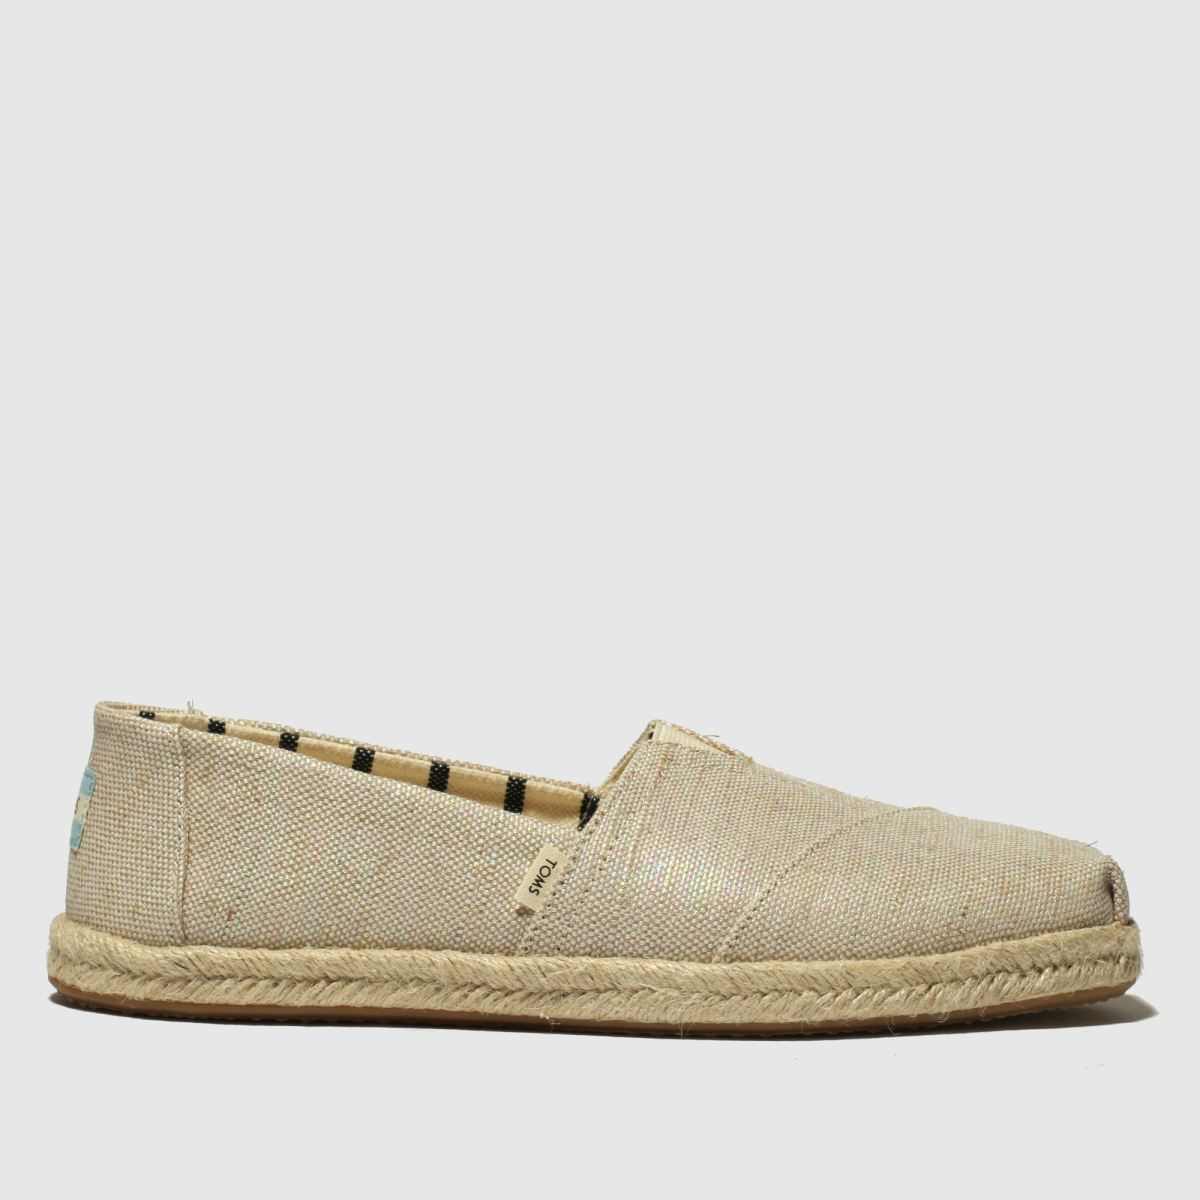 Toms Natural Alpargata Rope Sole Flat Shoes